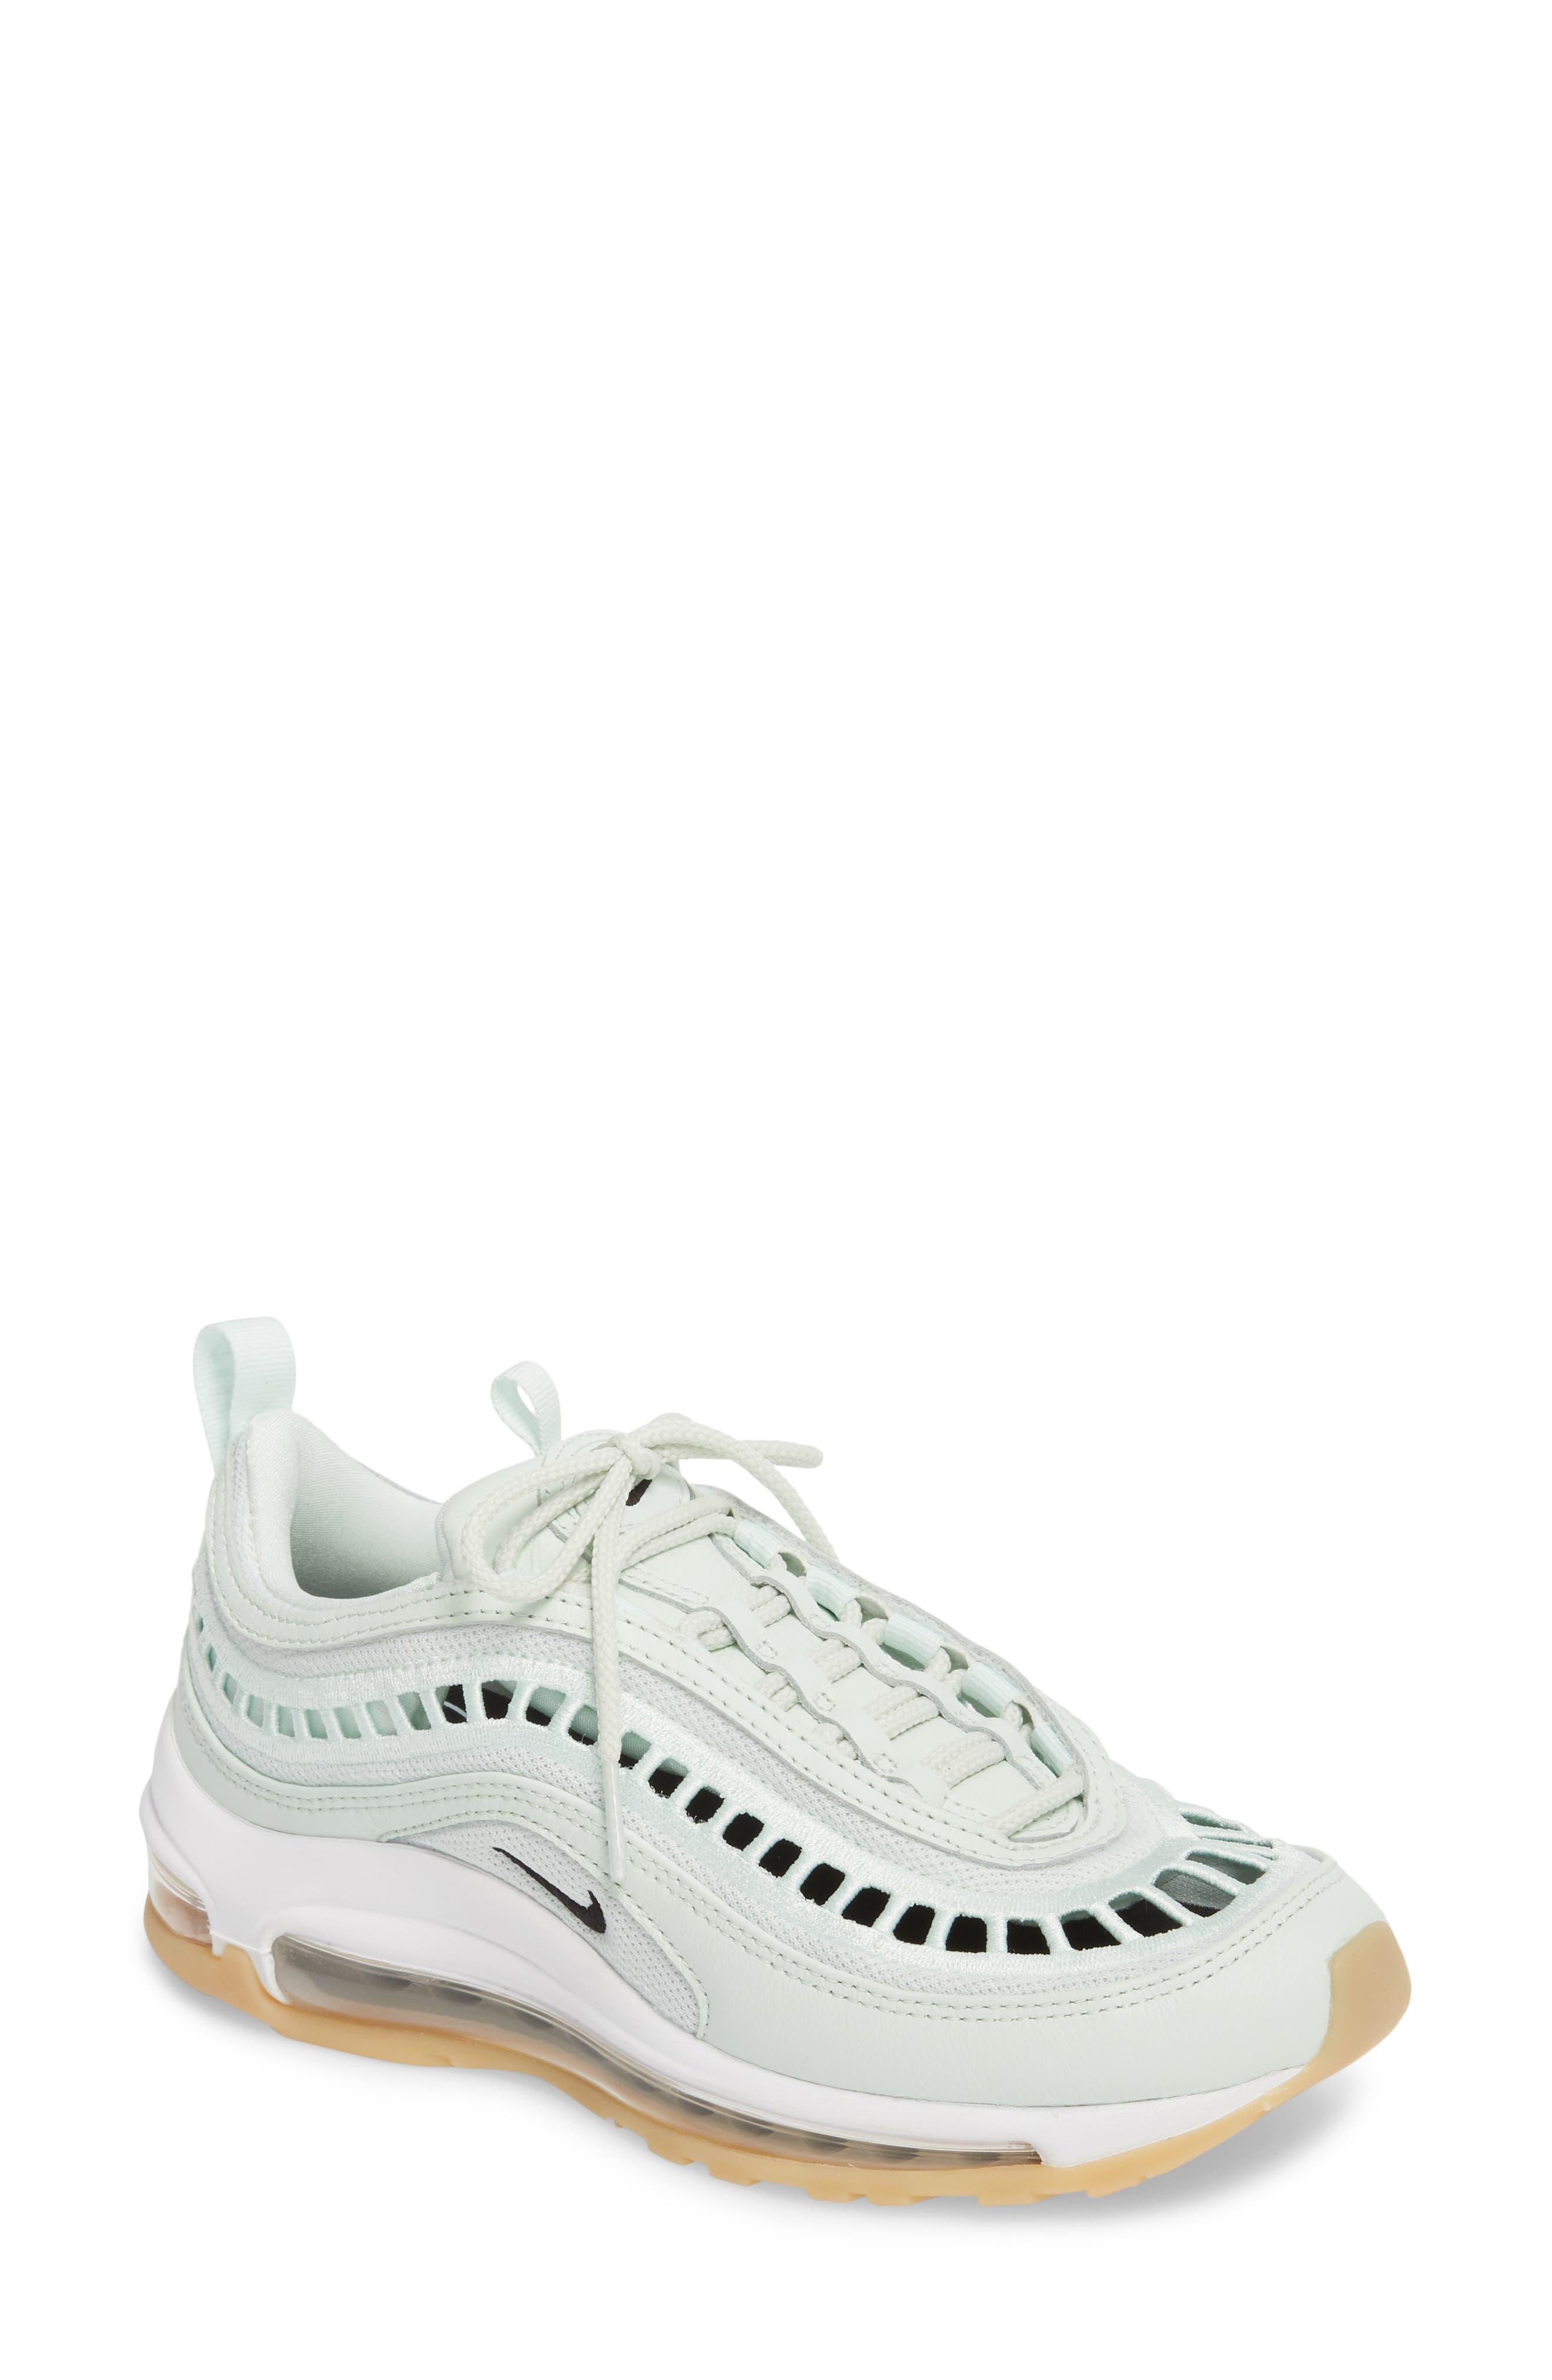 Air Max 97 Ultra '17 SI Sneaker,                             Main thumbnail 1, color,                             020